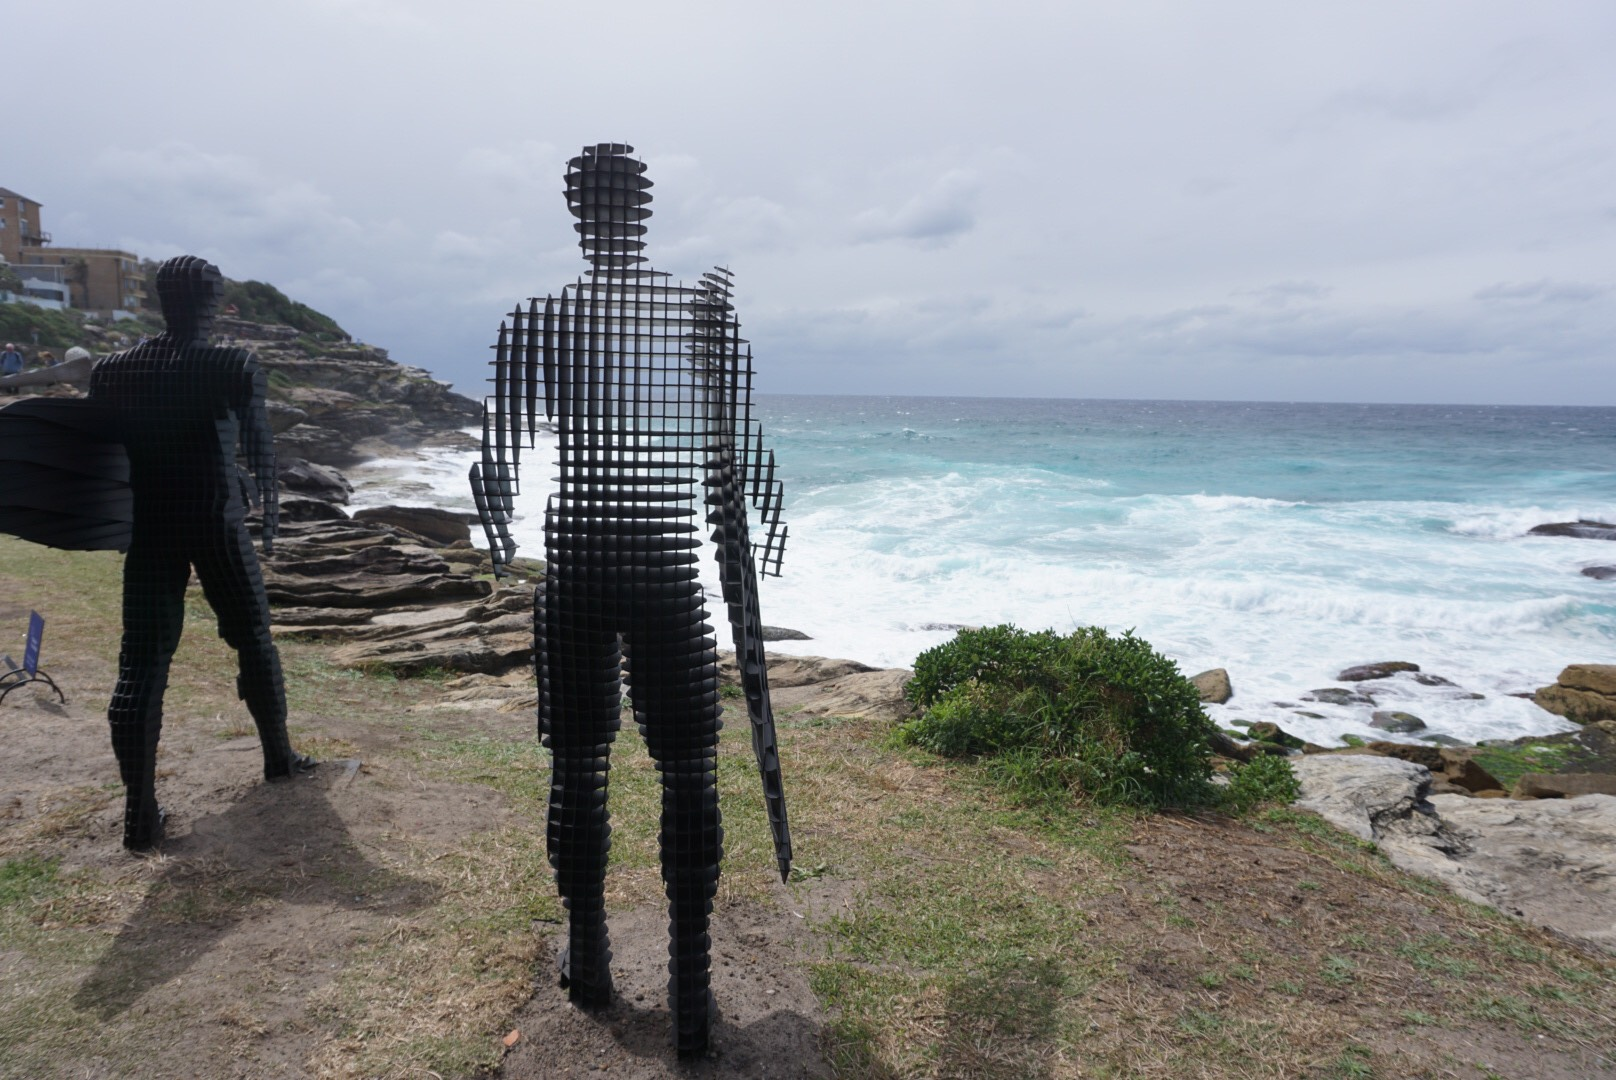 CAPAStudyAbroad_Sydney_Fall2017_From Hanna Okhrimchuk - Sculpture by the Sea Exhibition_2.jpg